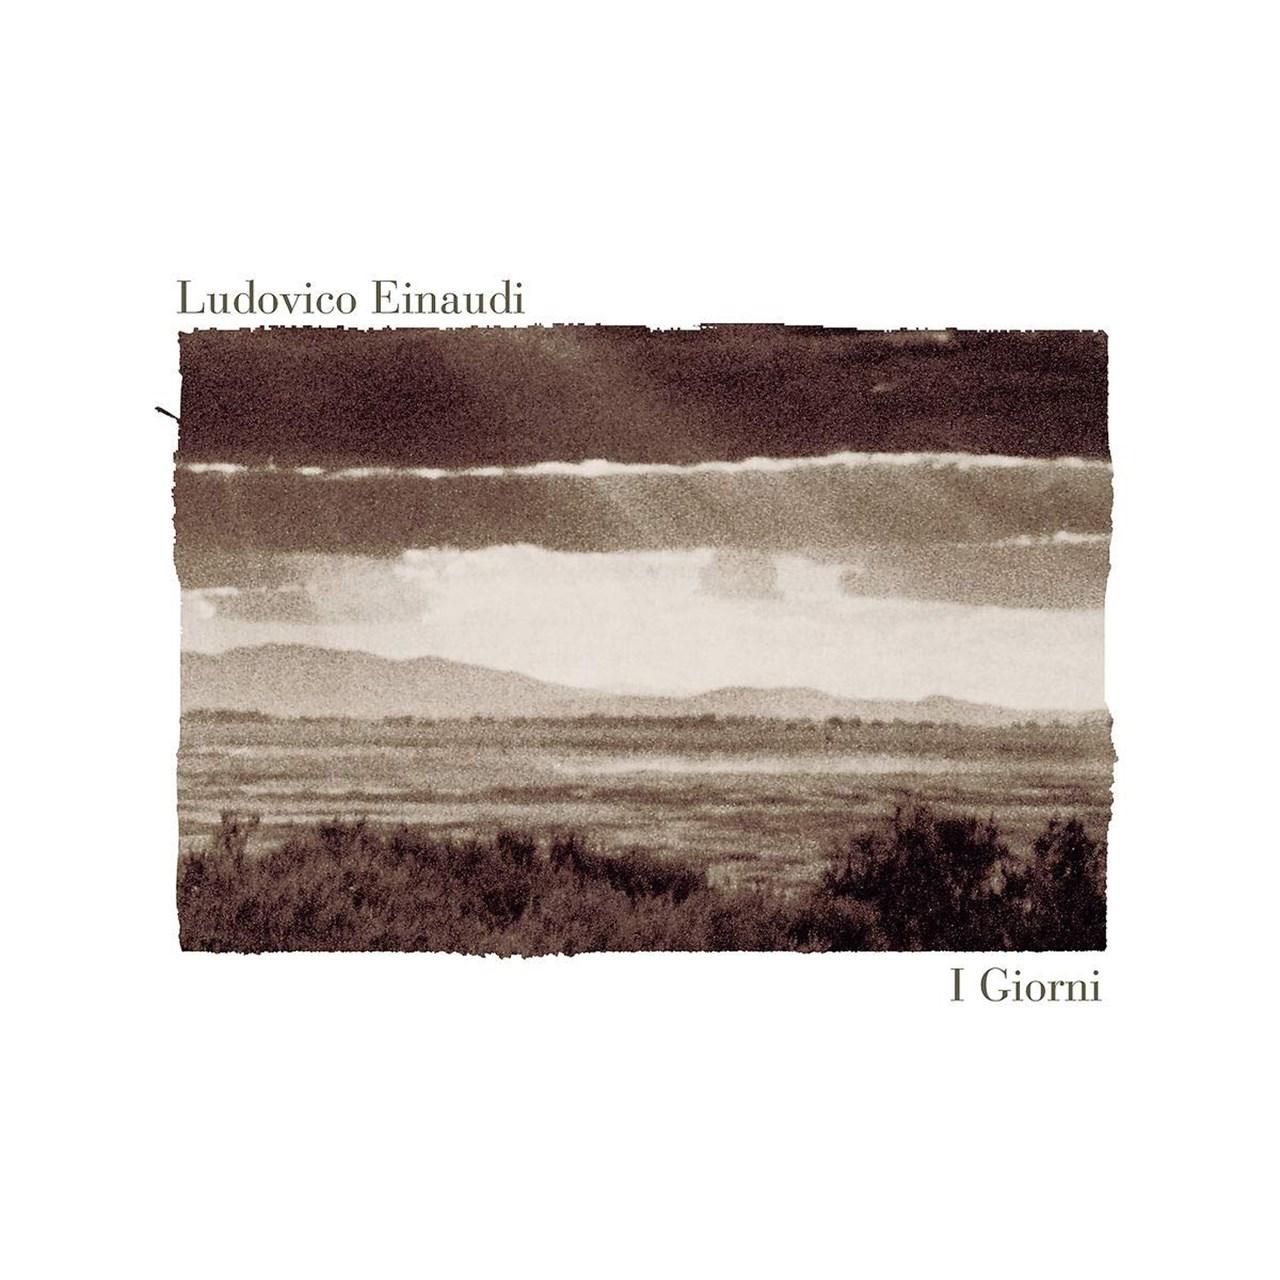 Ludovico Einaudi: I Giorni - 1